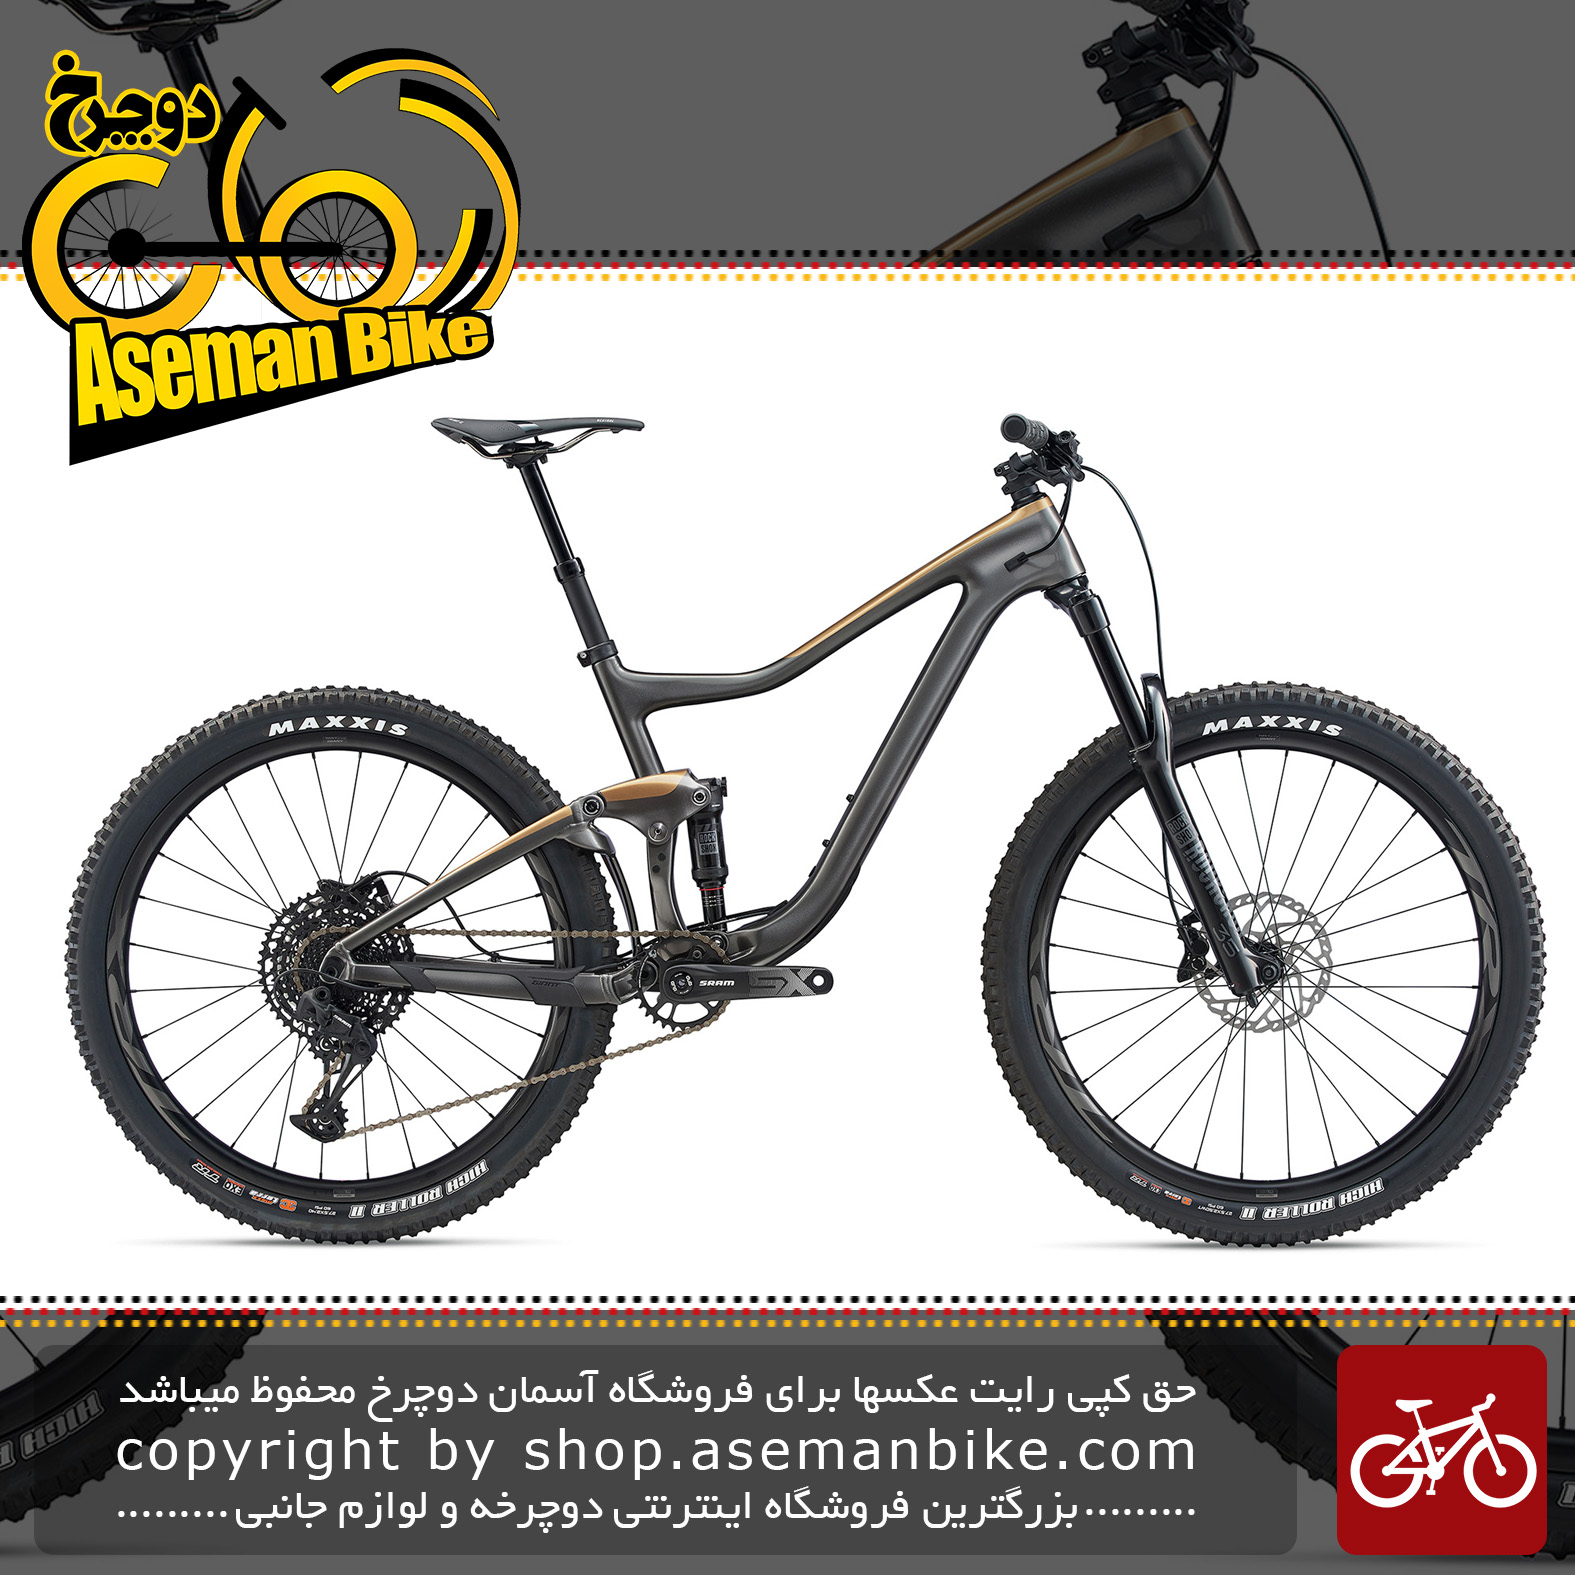 دوچرخه کوهستان جاینت مدل ترنس ادونس 2 2020 Giant Mountain Bicycle Trance Advanced 2 2020